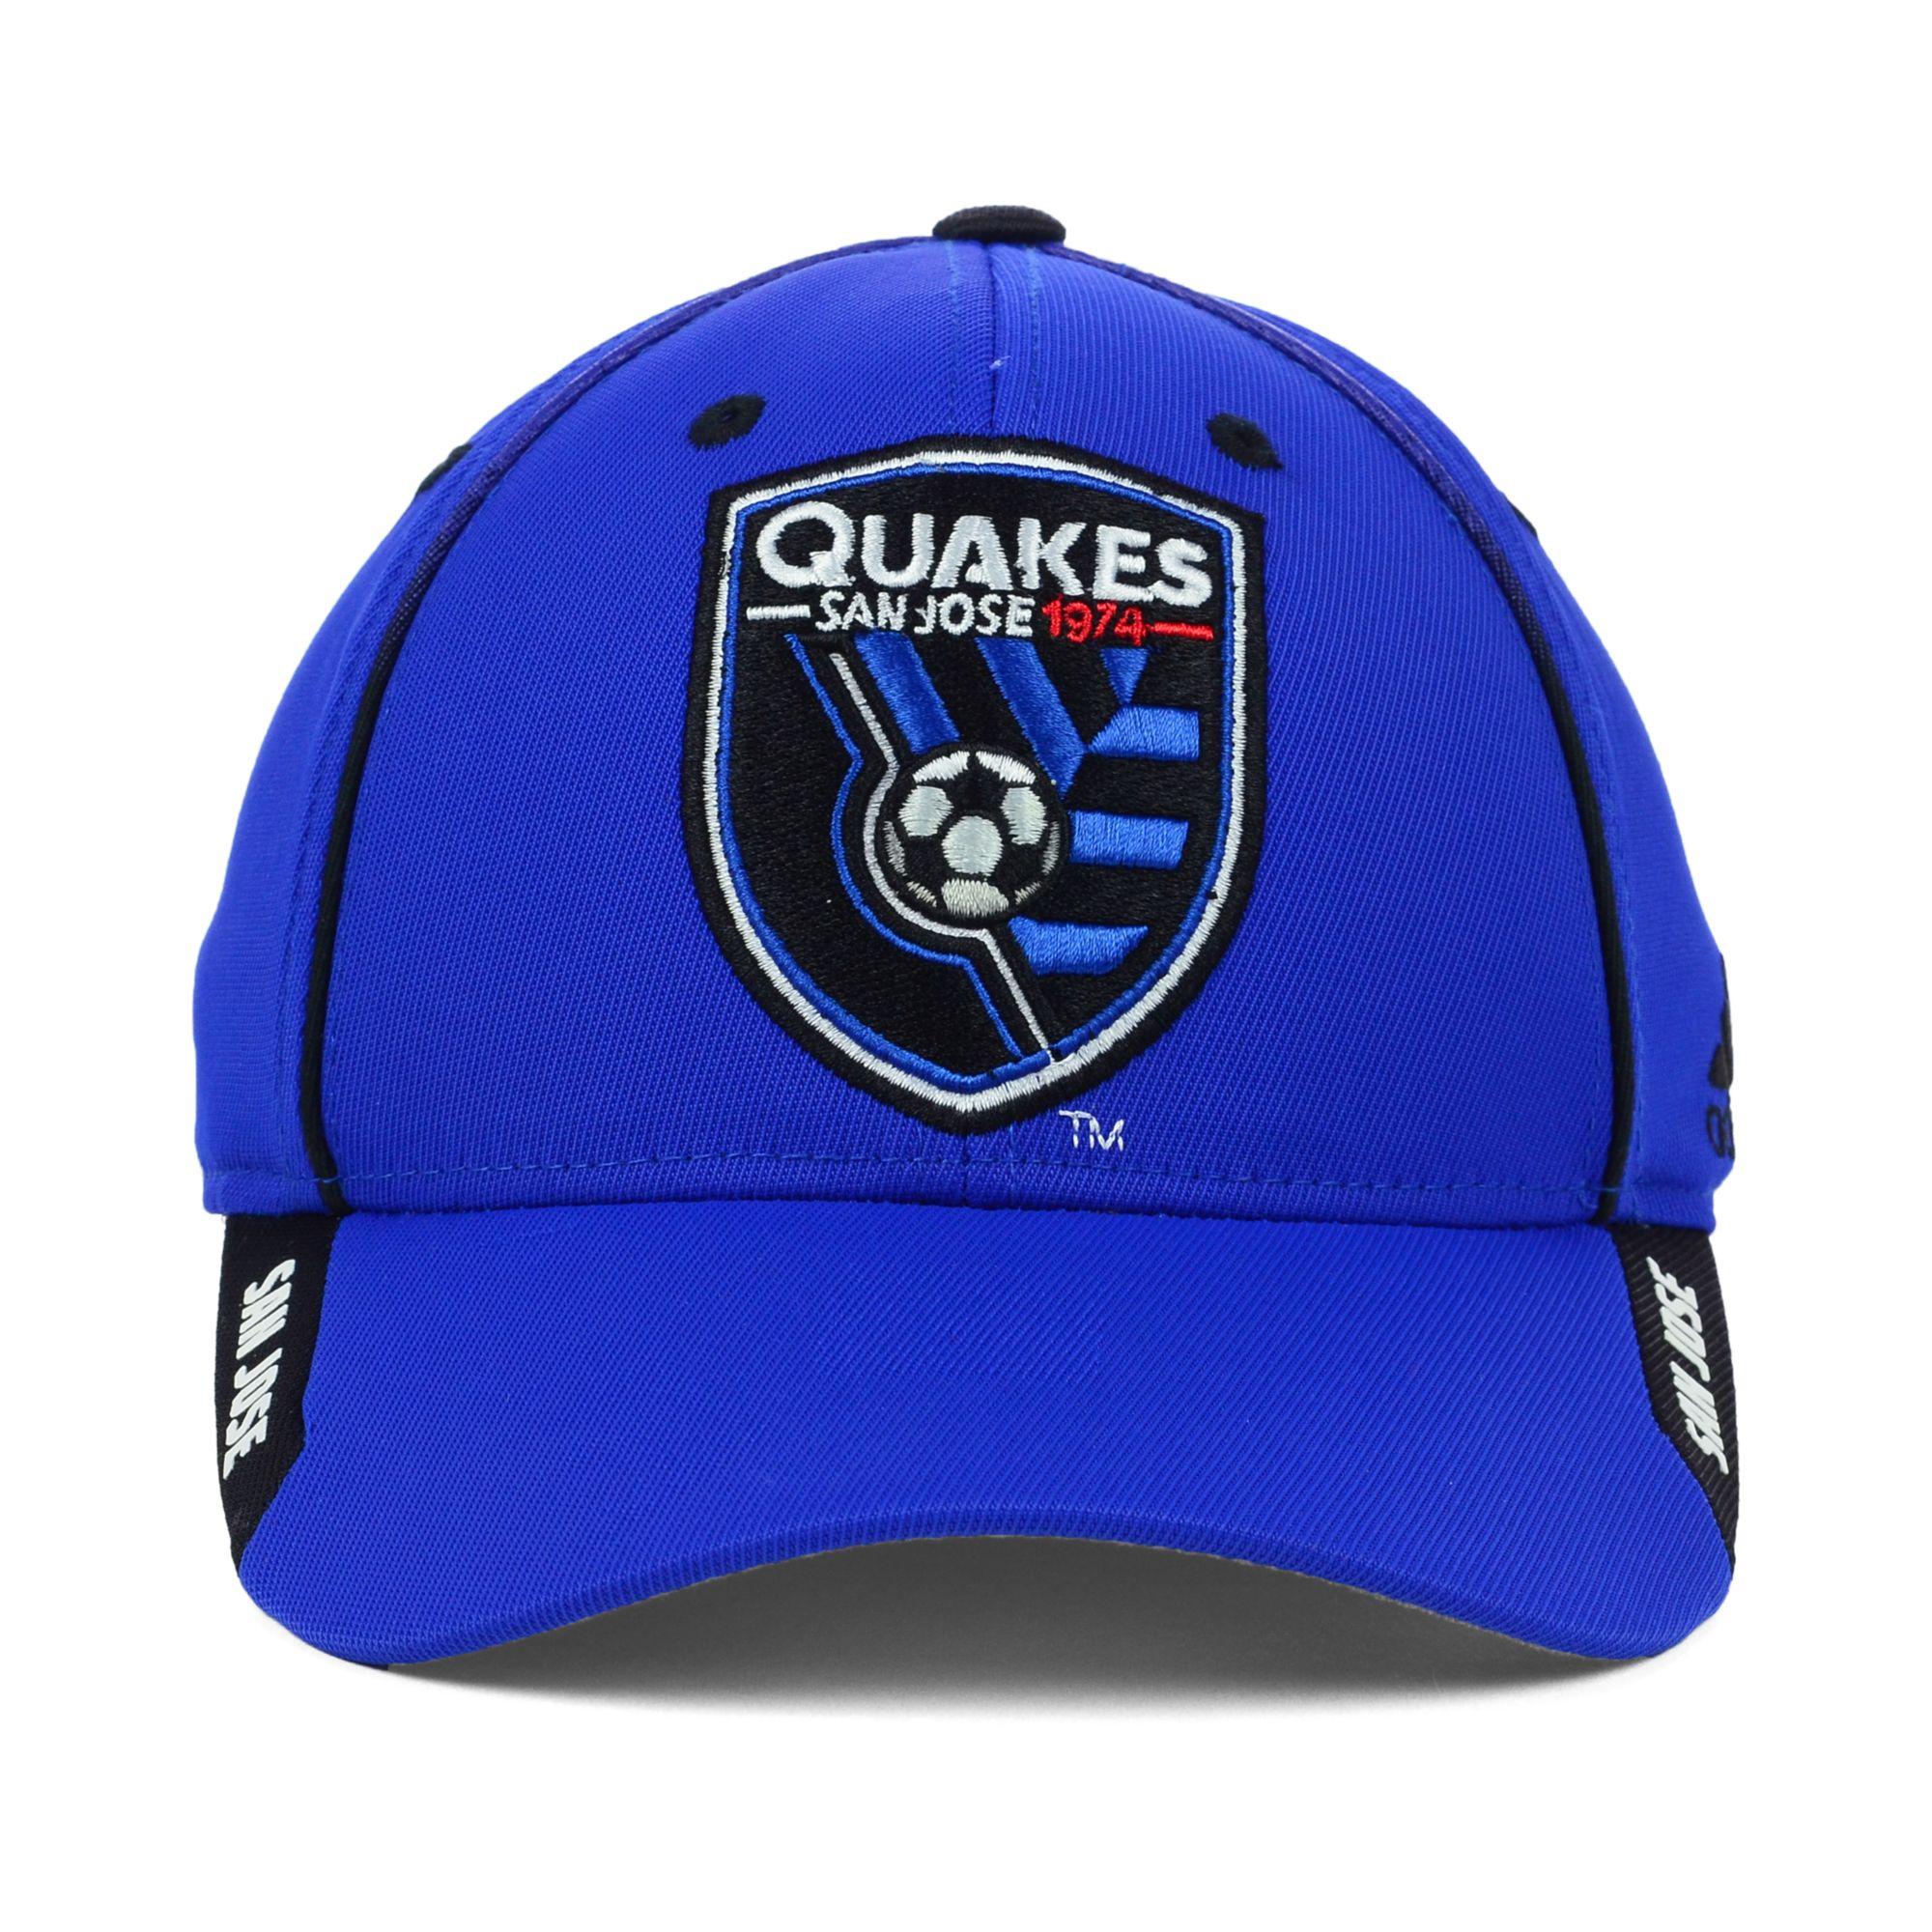 best cheap 02ec5 360d5 ... purchase lyst adidas san jose earthquakes mls mid fielder cap in blue  for men 73e1f 58c5e